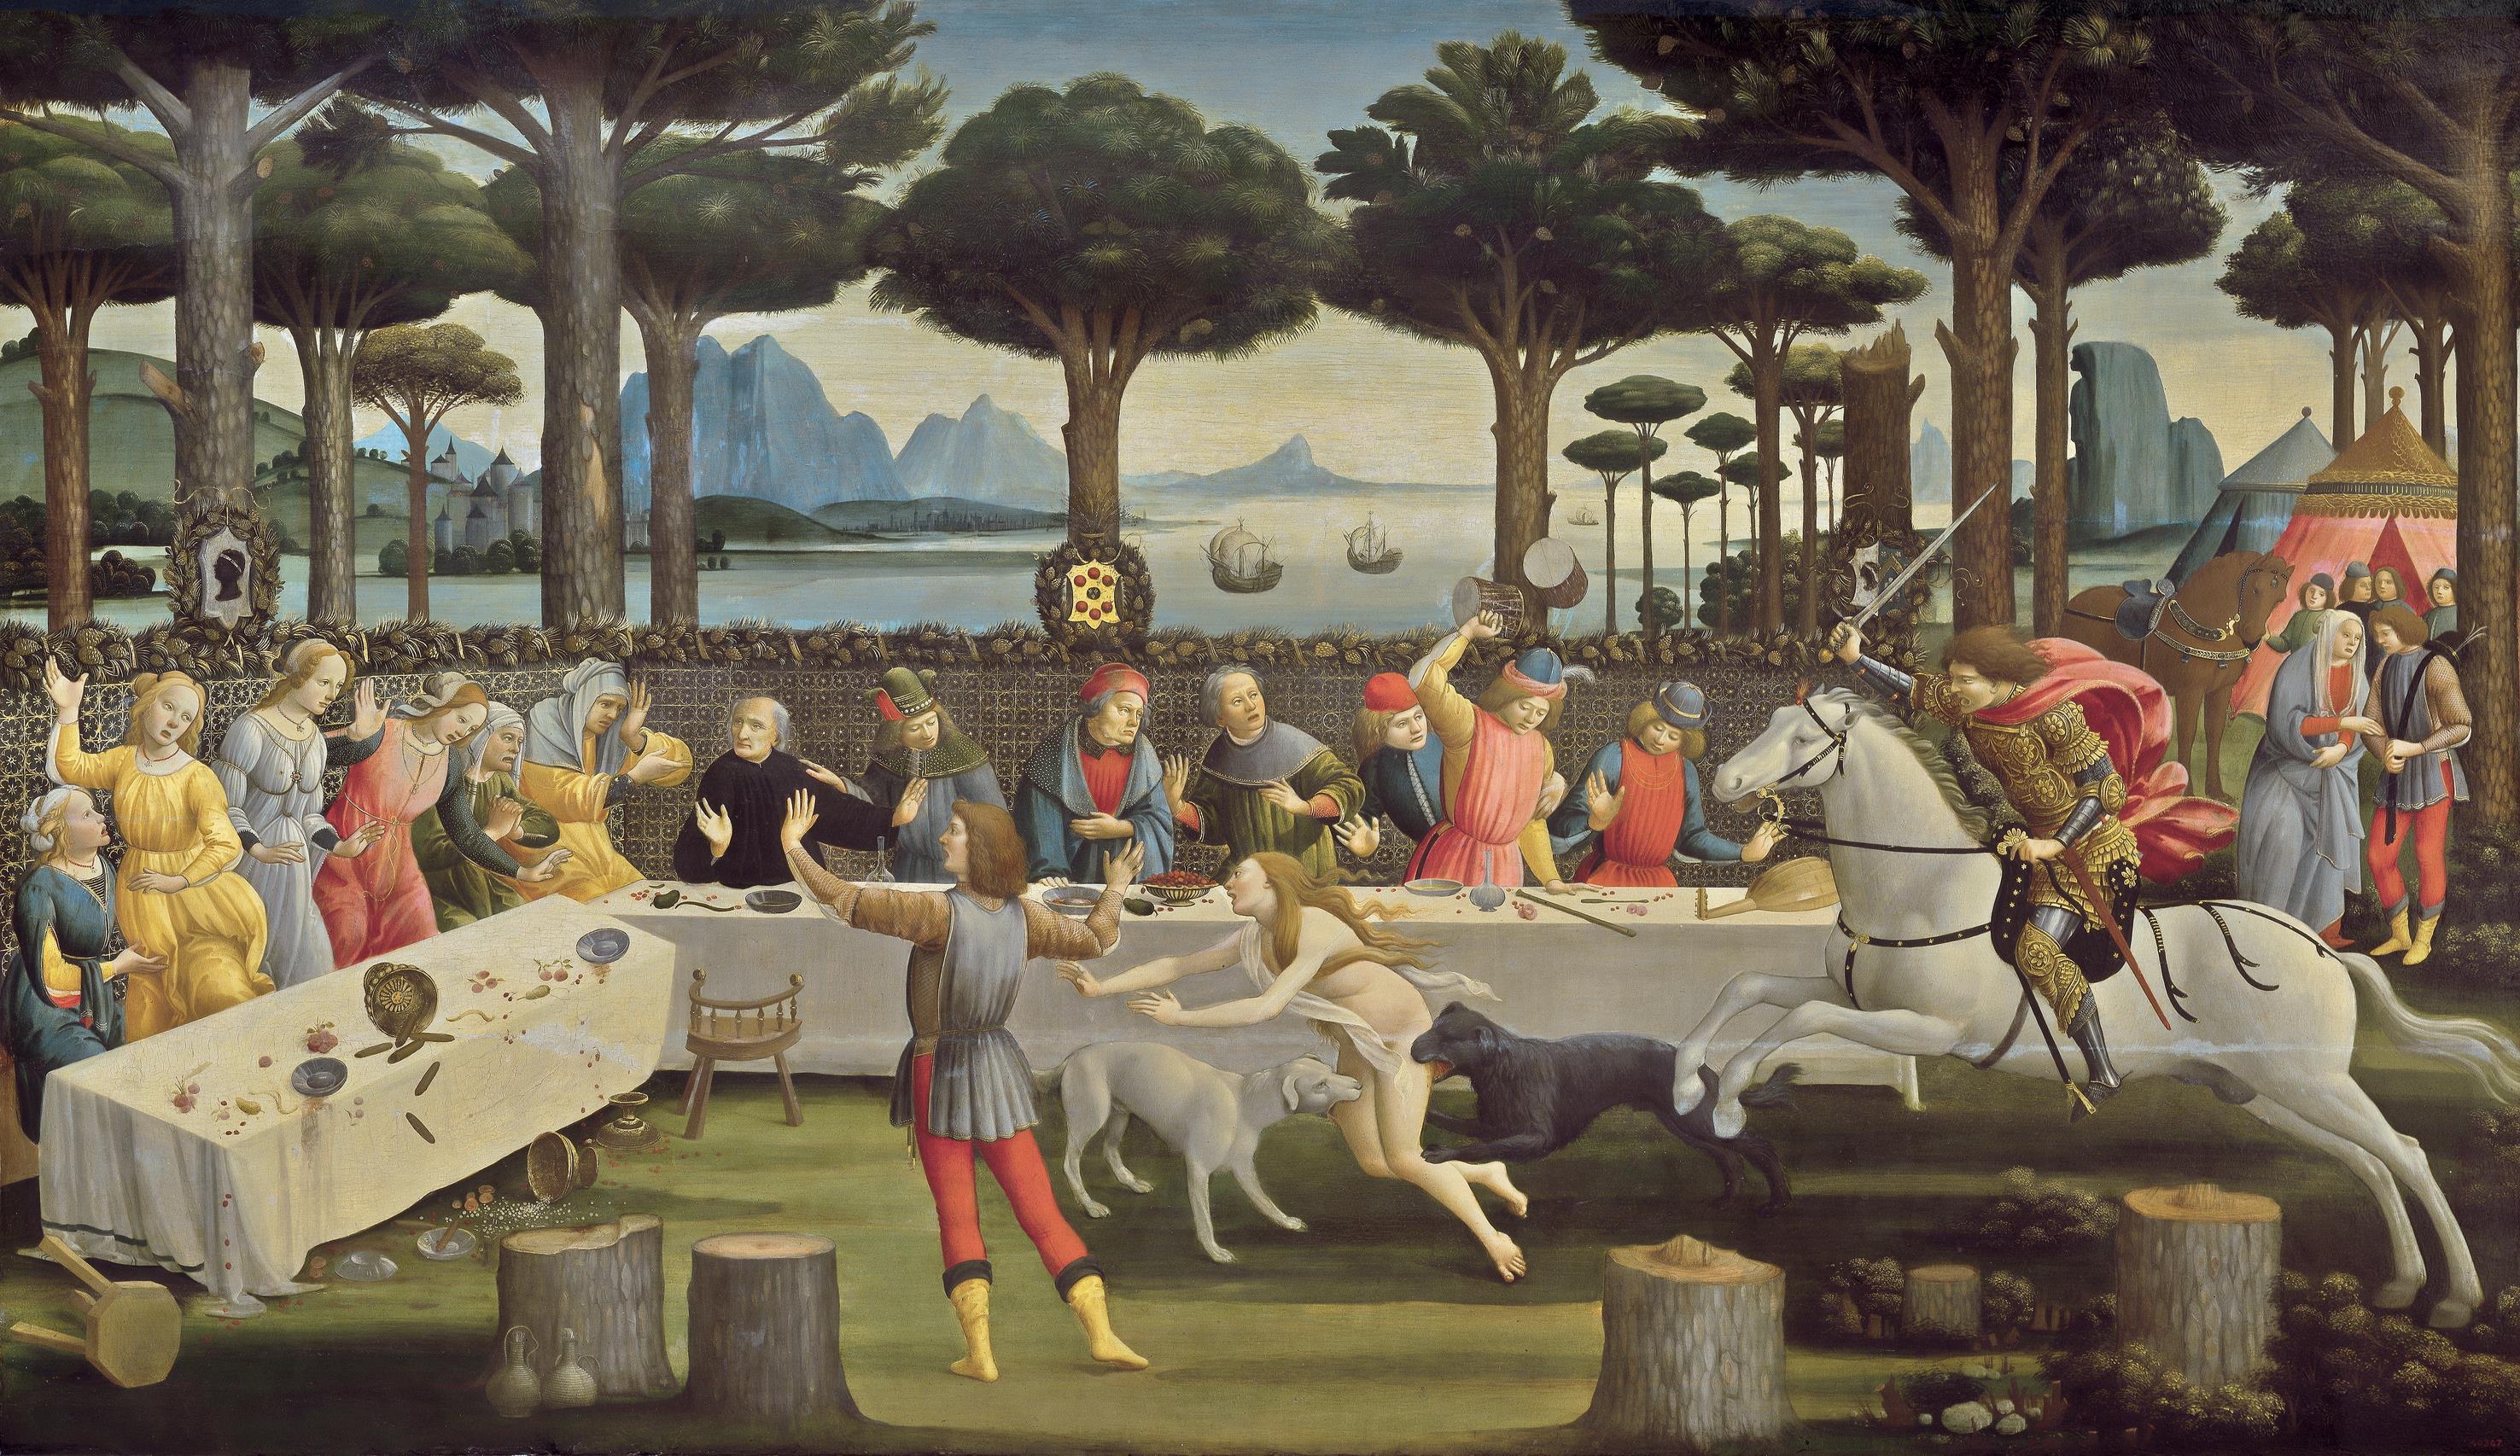 https://upload.wikimedia.org/wikipedia/commons/9/95/Botticelli_Prado_49.jpg